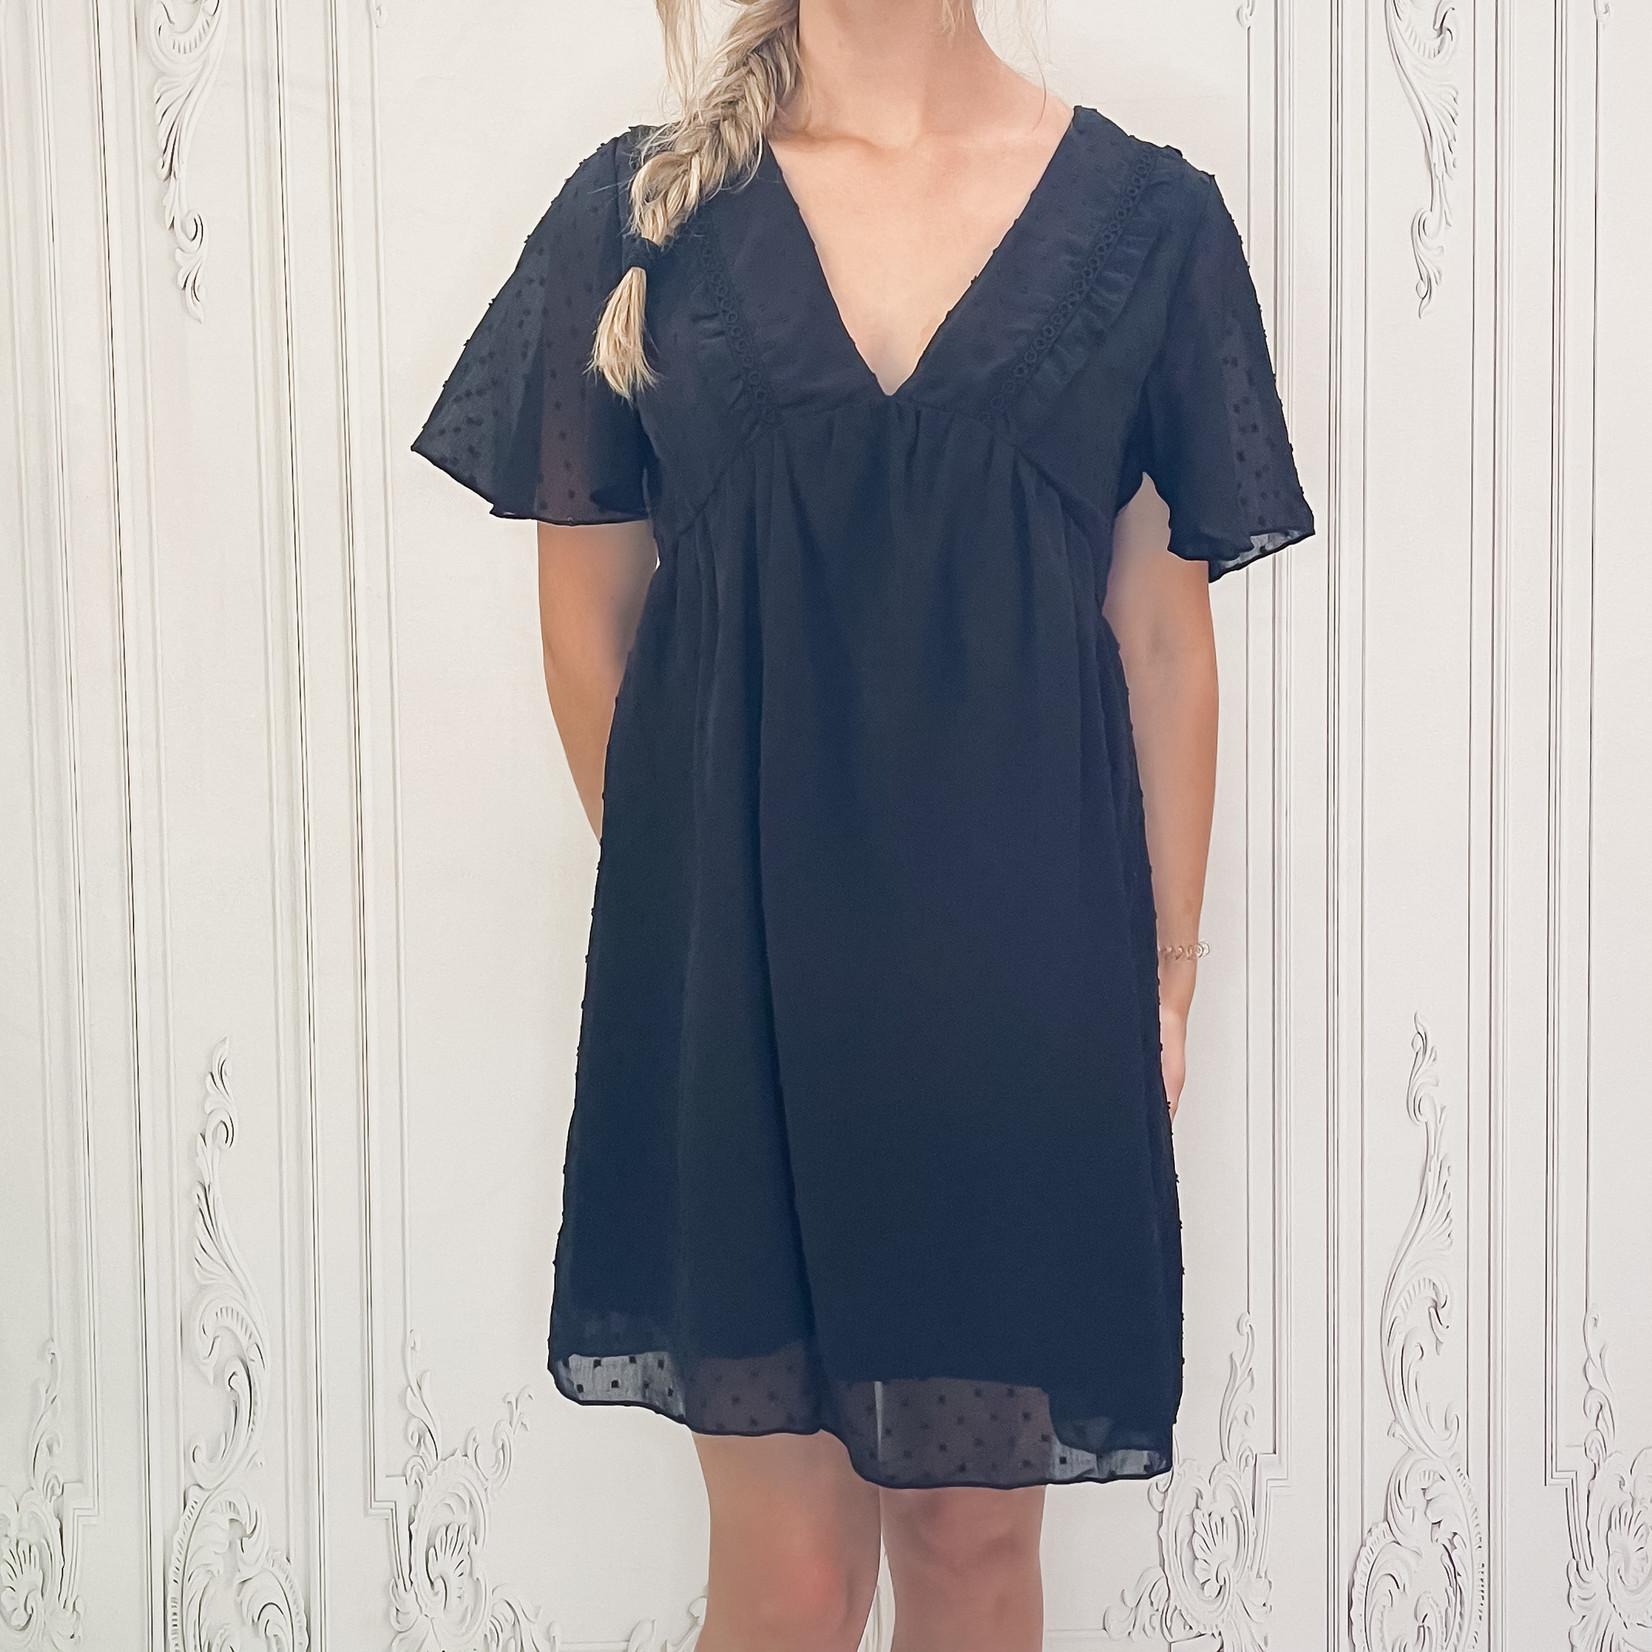 SusieQ babydoll dress